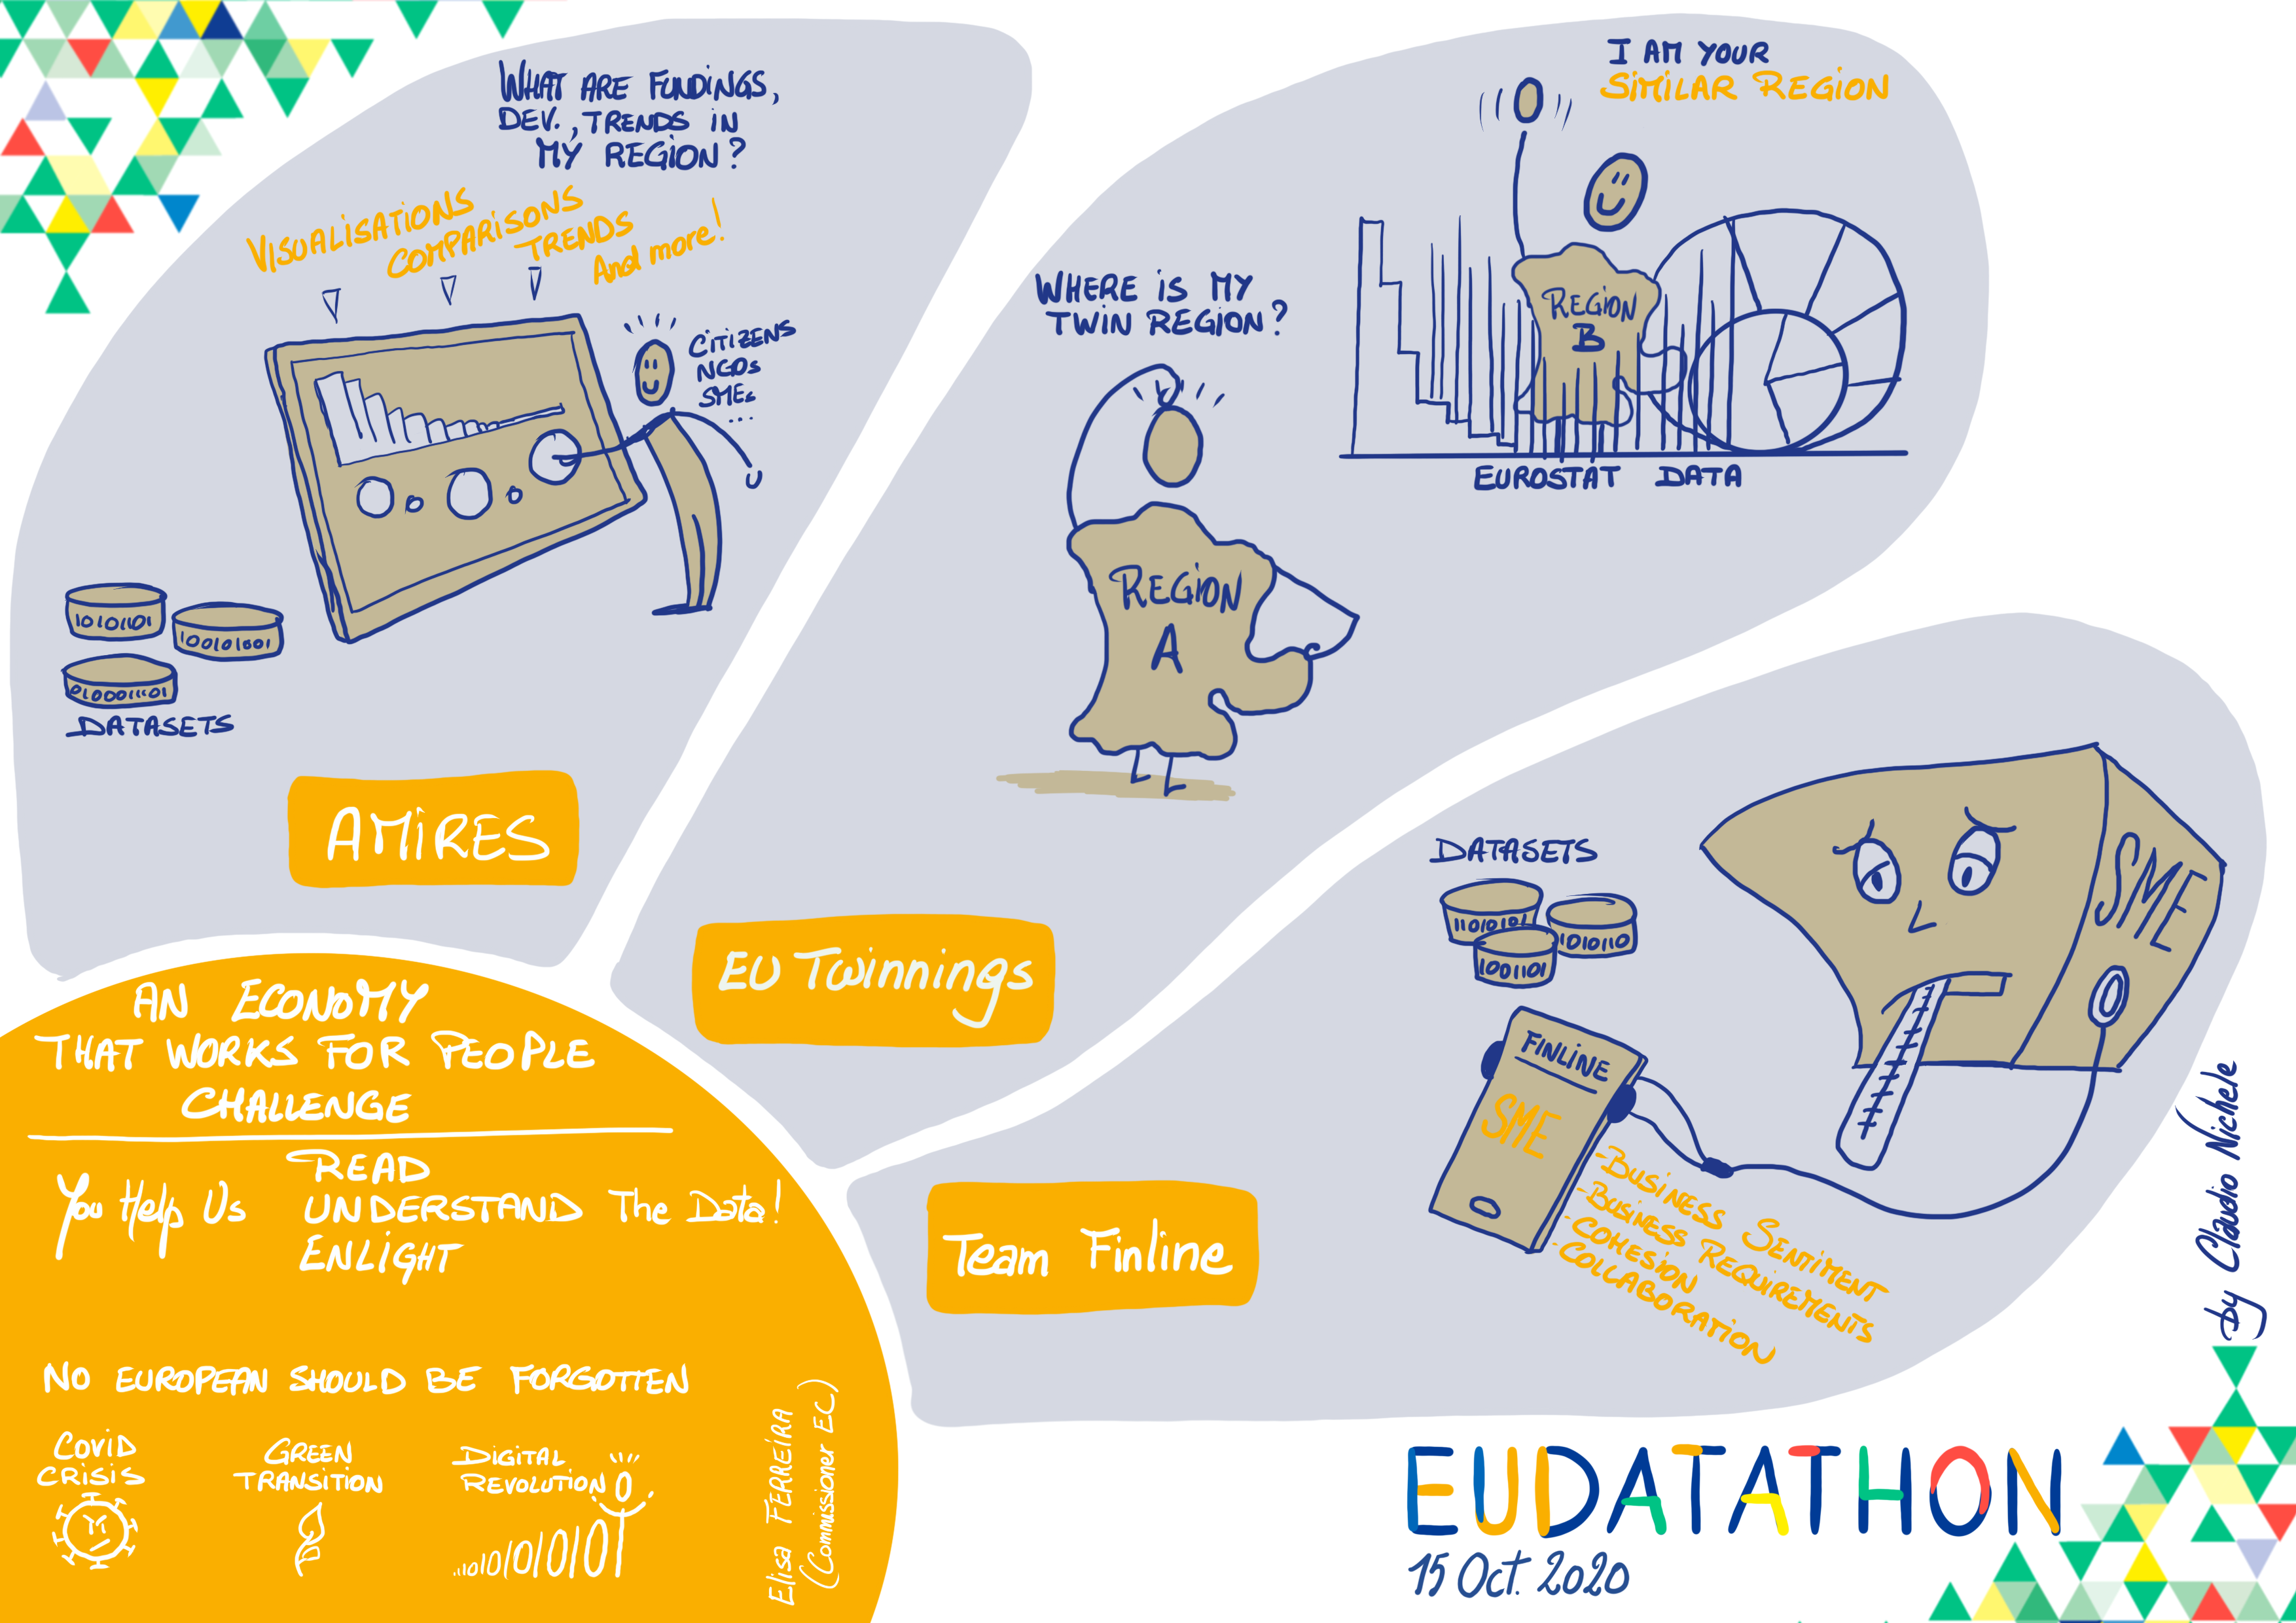 EU Datathon 2020 challenge 2